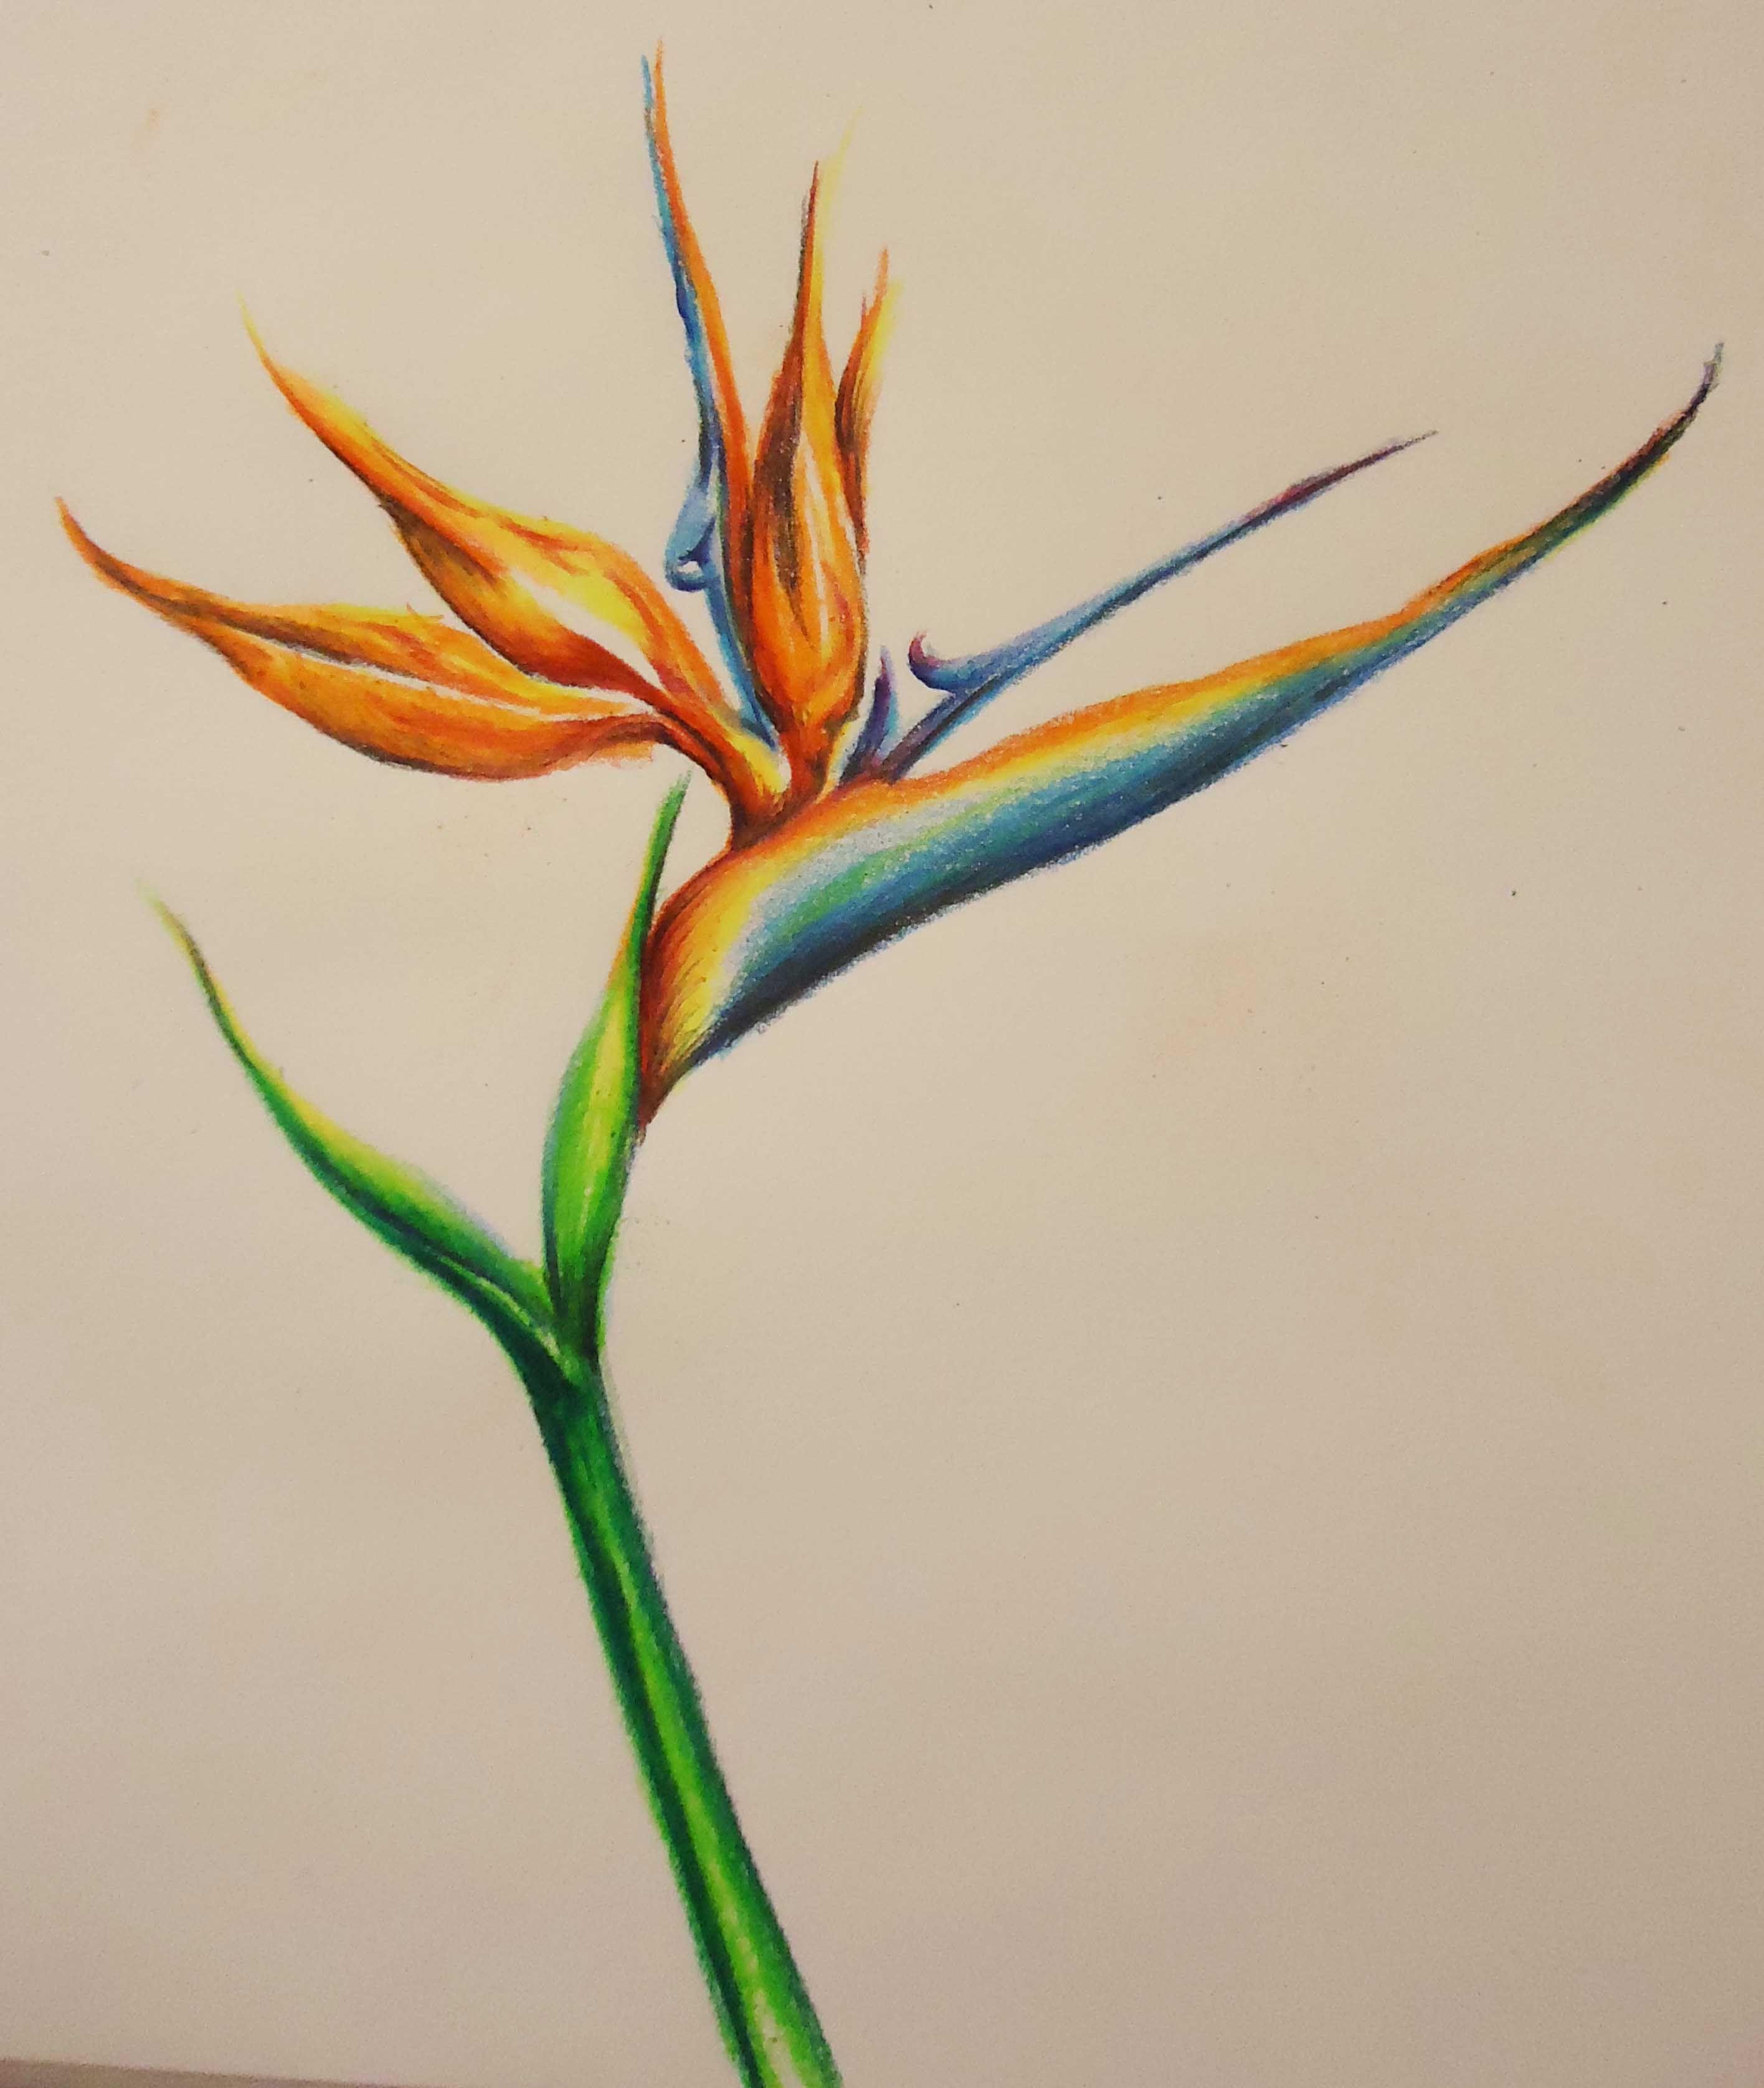 Bird Of Paradise Colored Pencil Prismacolor By Jennifer Cenzori Lenahan Color Pencil Sketch Color Pencil Art Birds Of Paradise